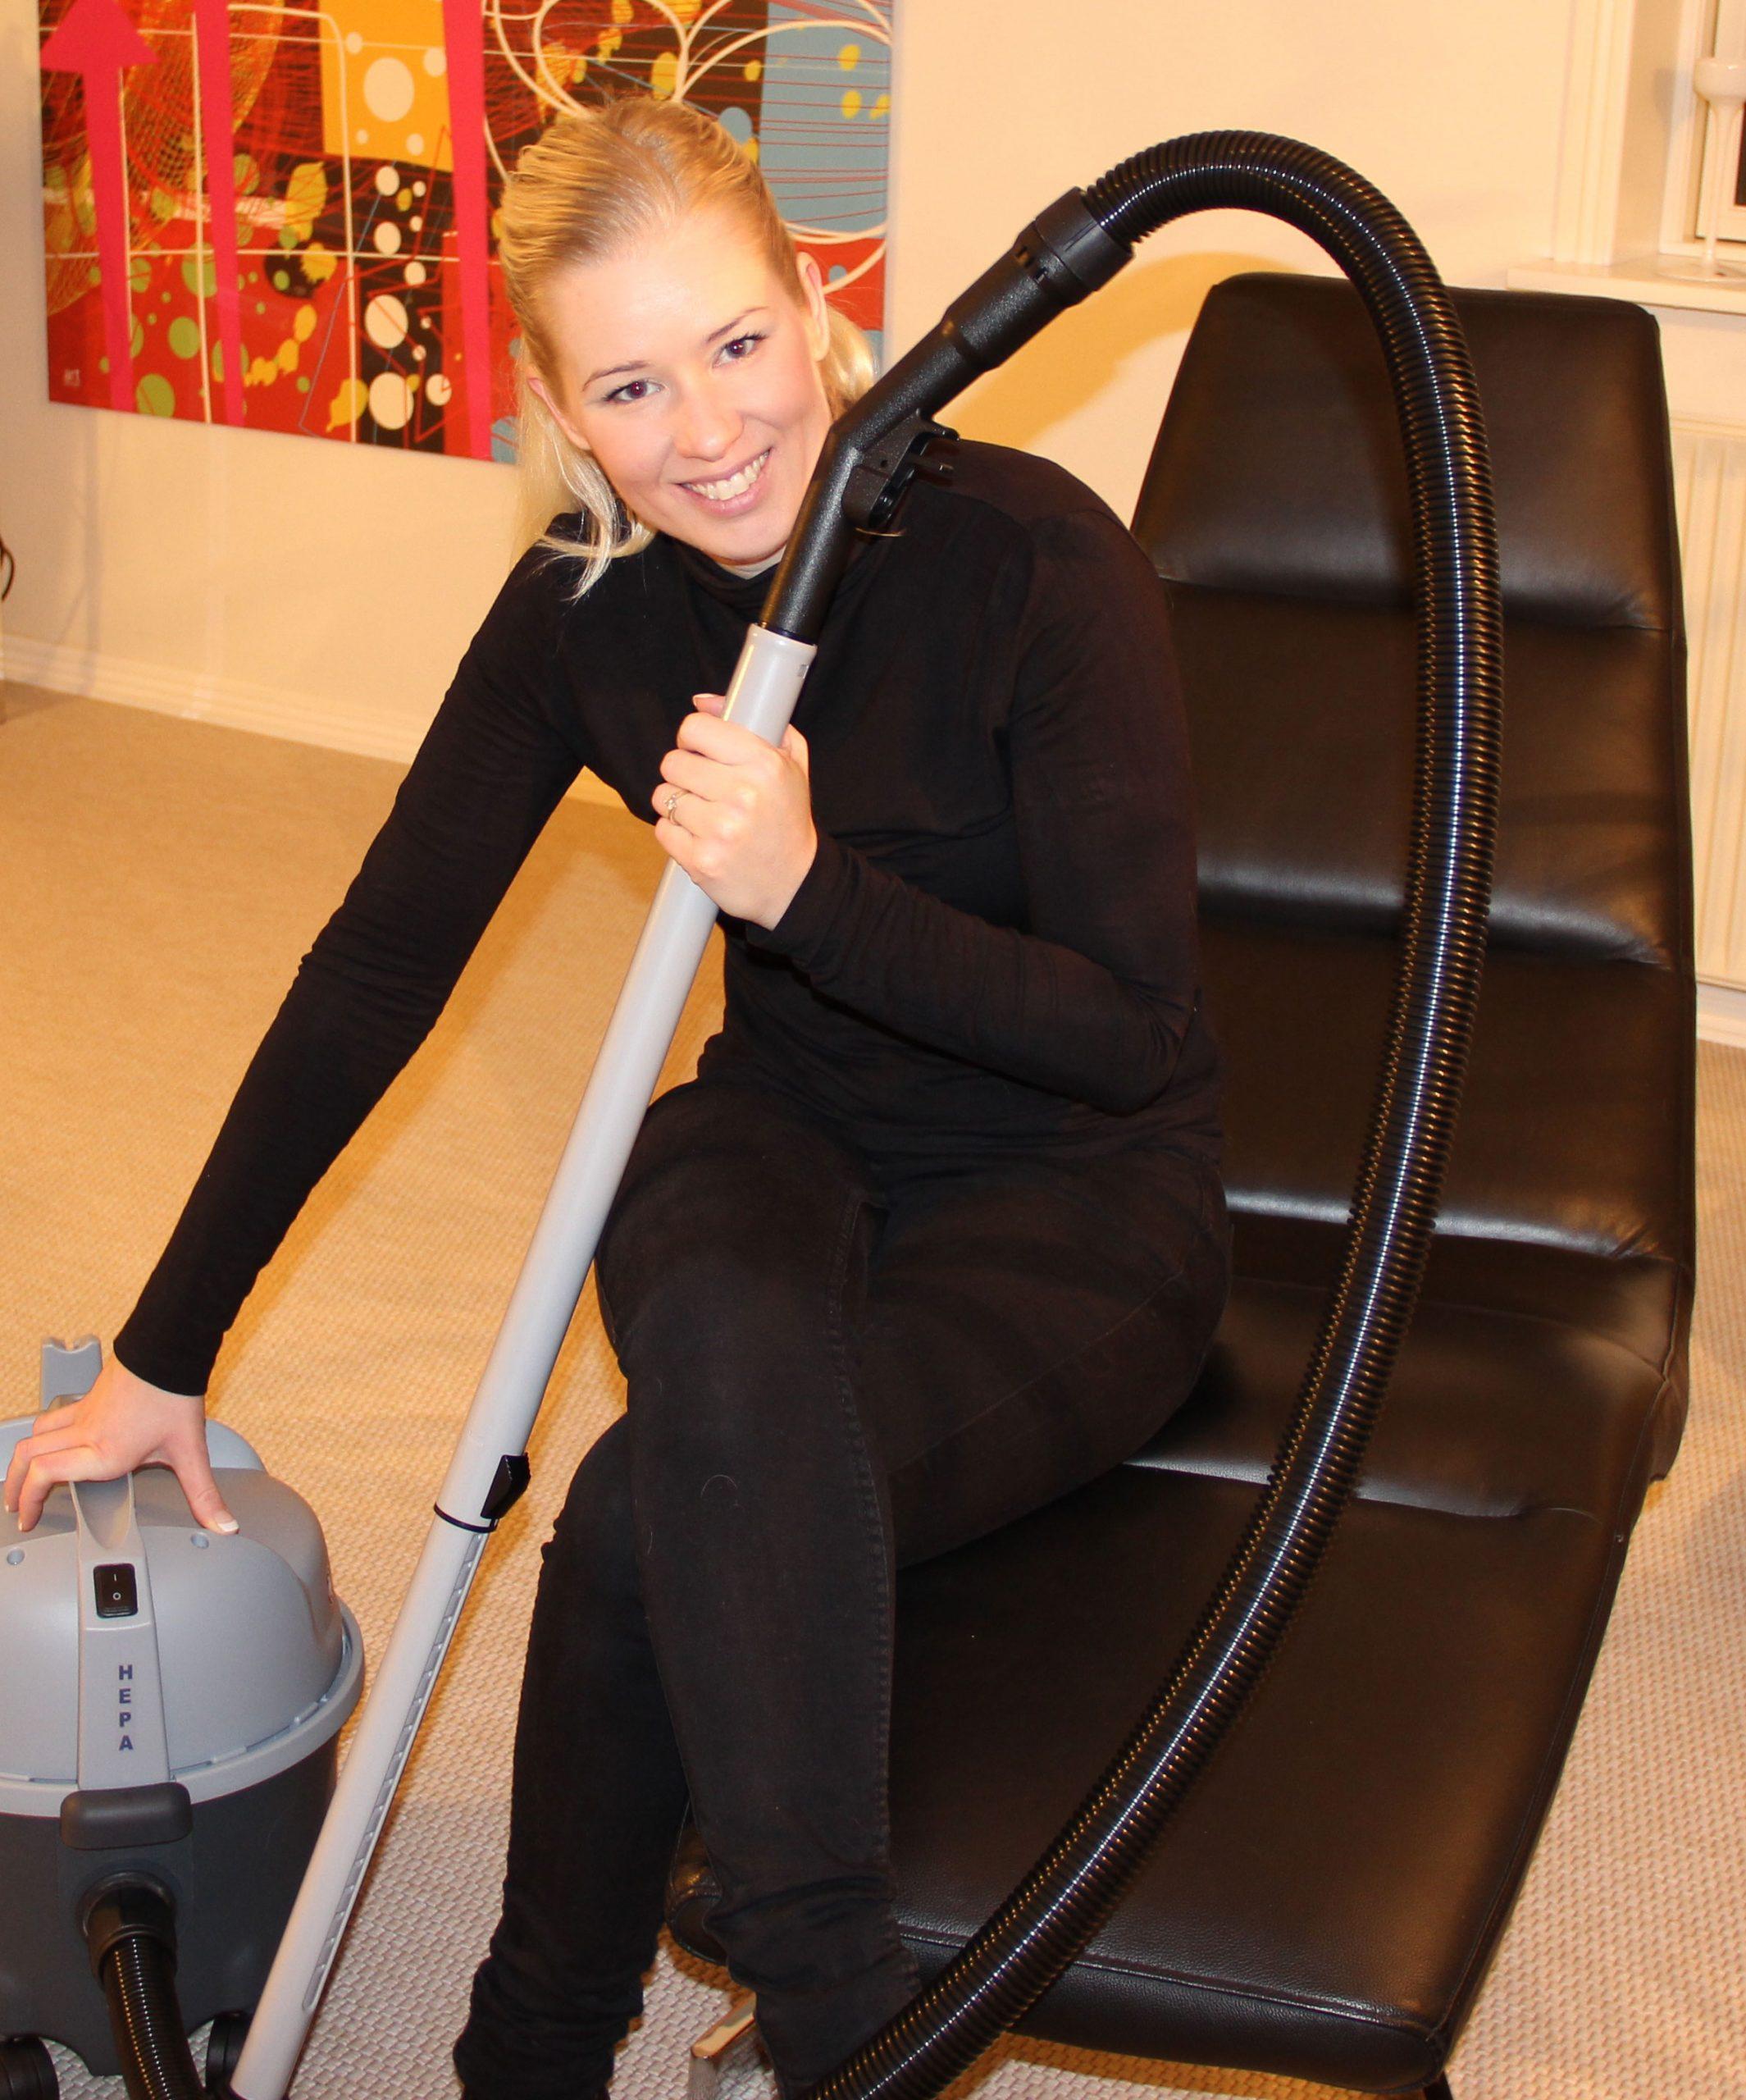 Støvsugning, Rengøringsekspert Louise Grønhøj